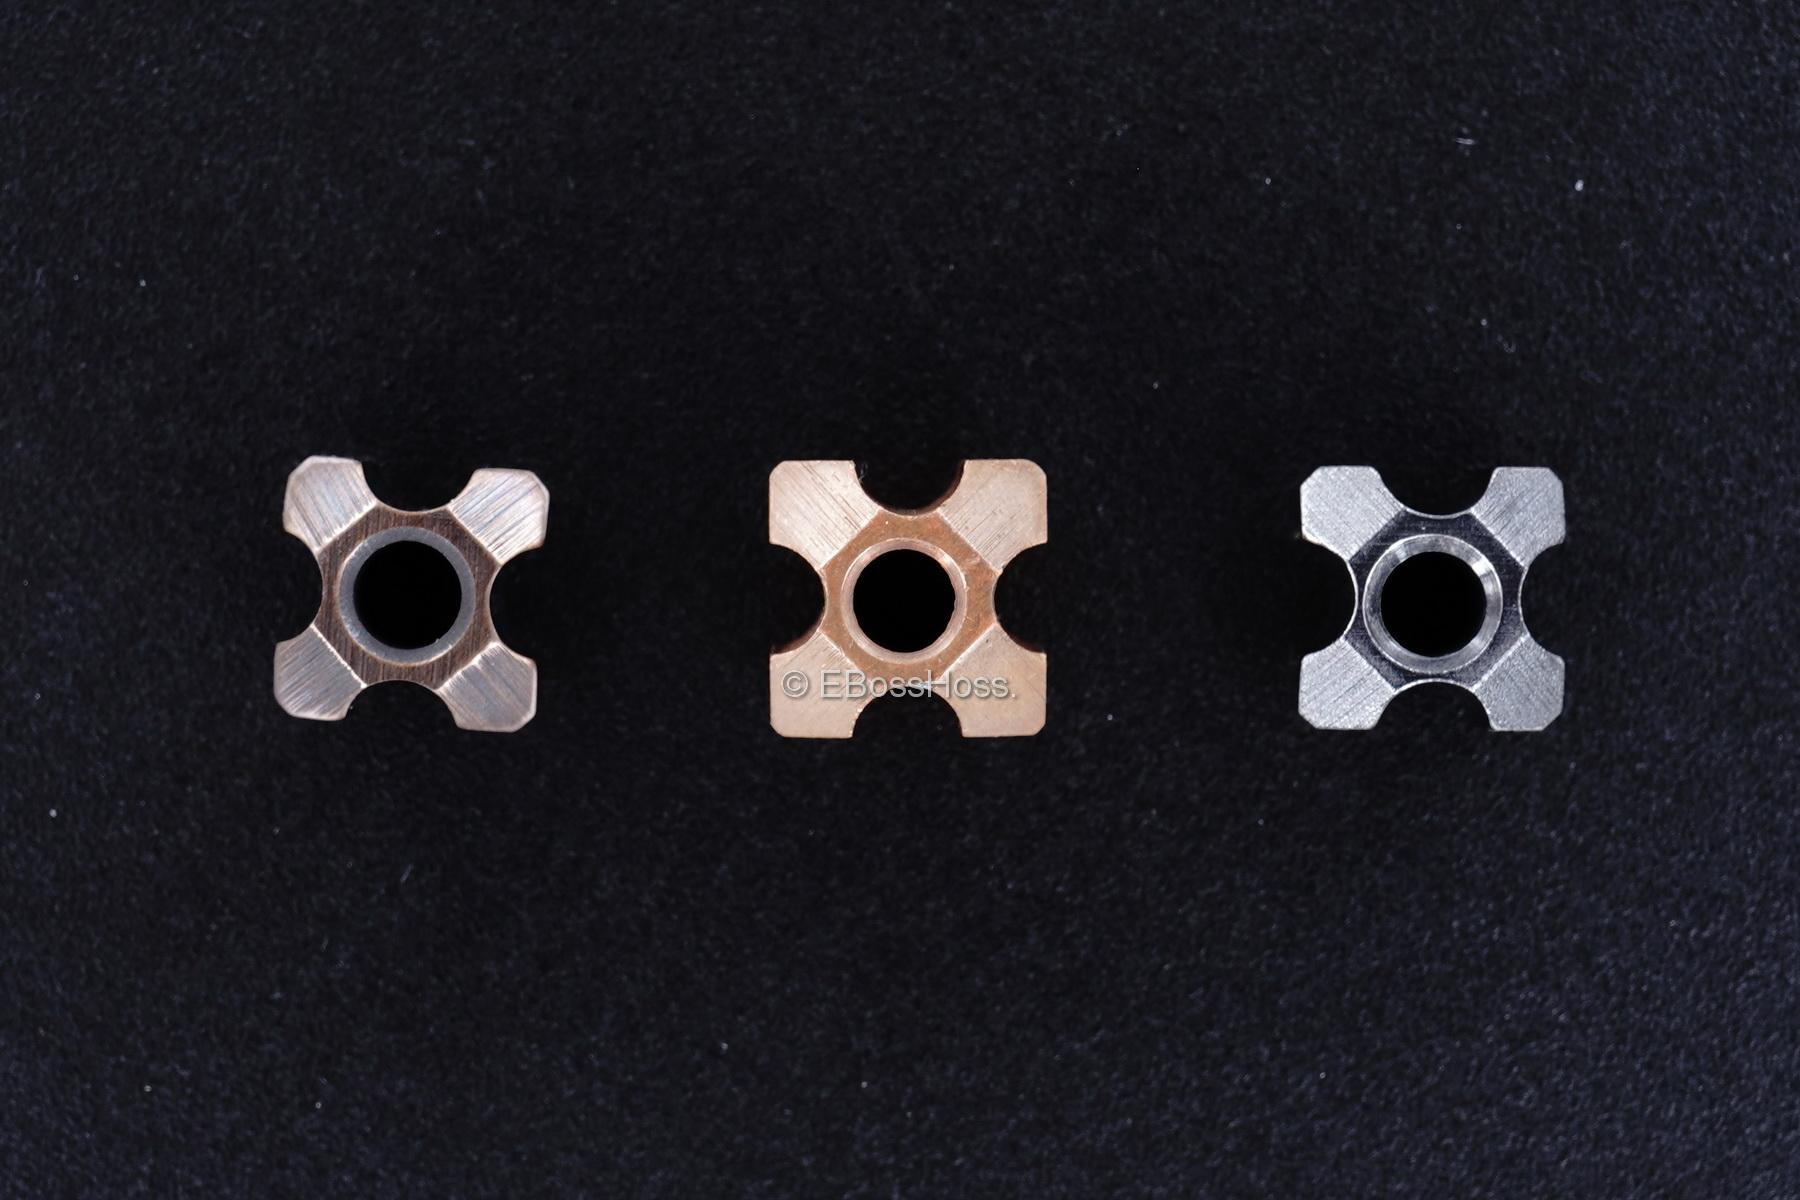 Brad Blount / JBB 3 Assorted Beads